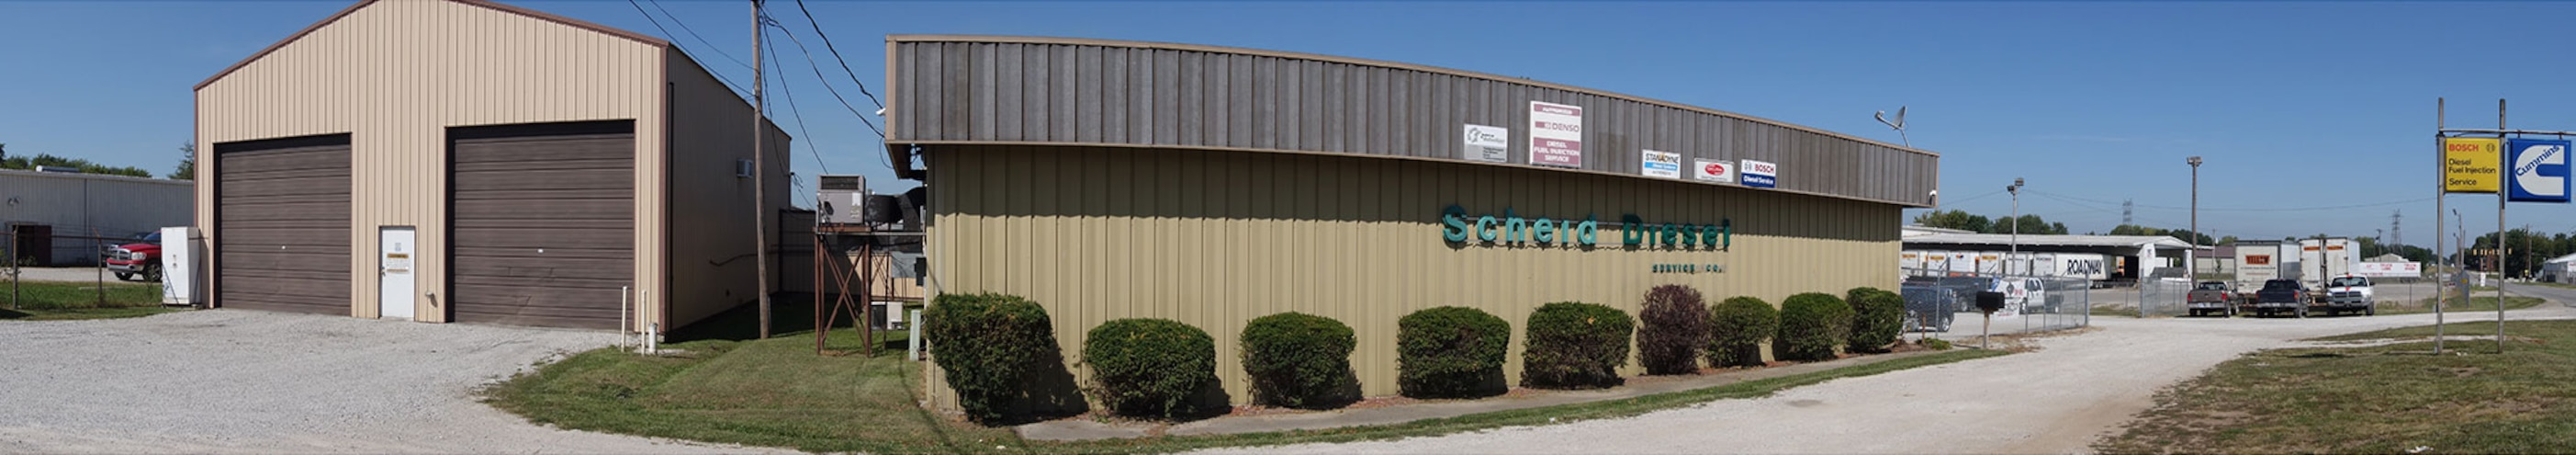 002 Headquarters